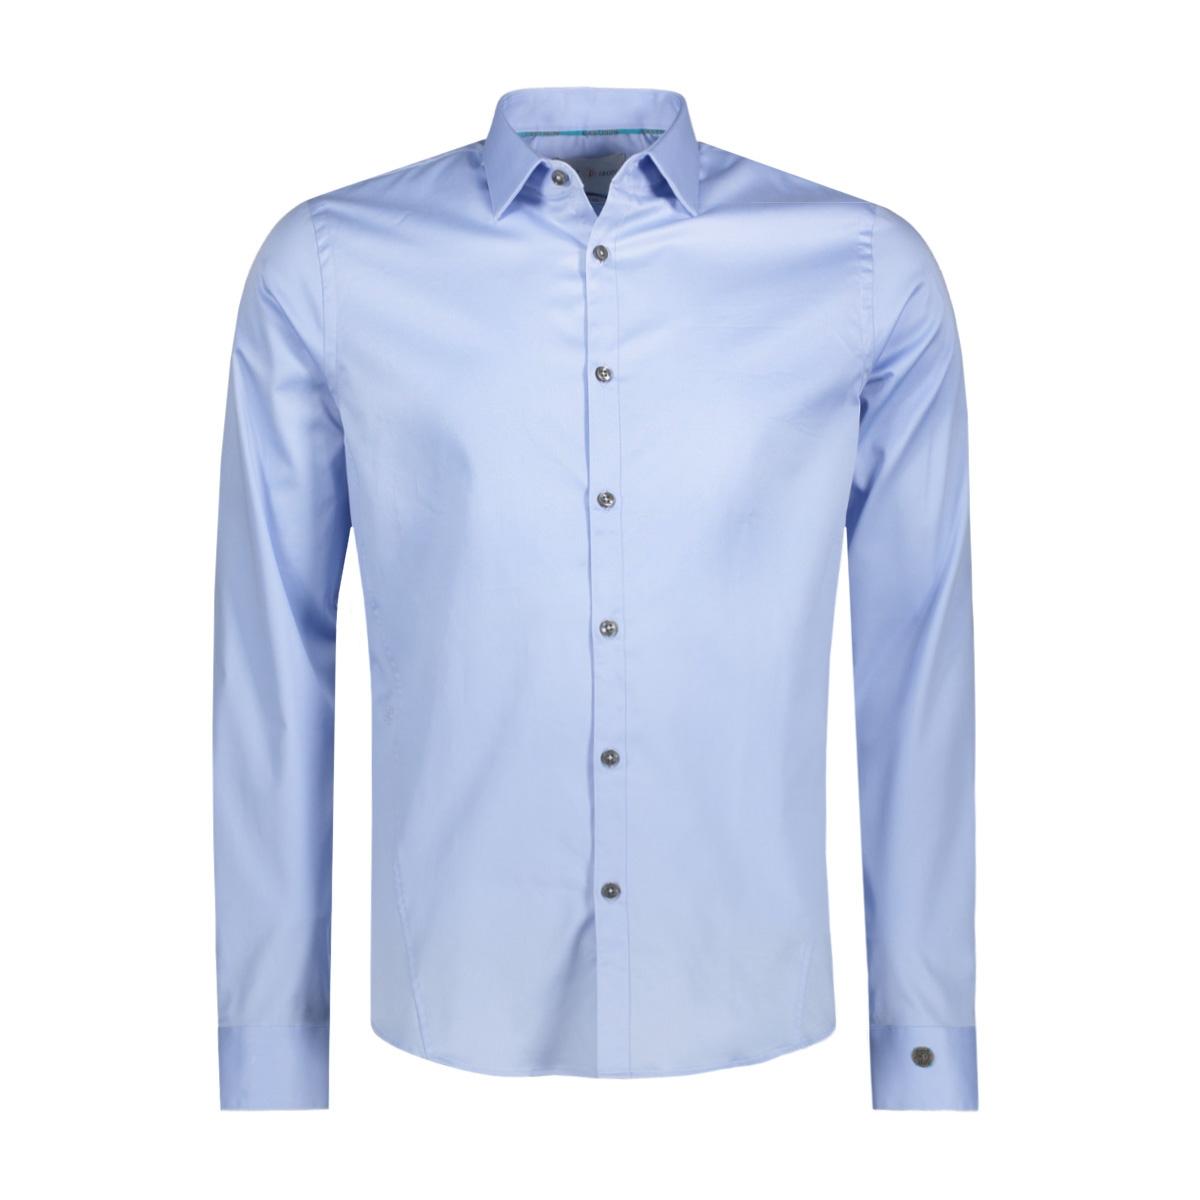 csi00429 cast iron overhemd 5316